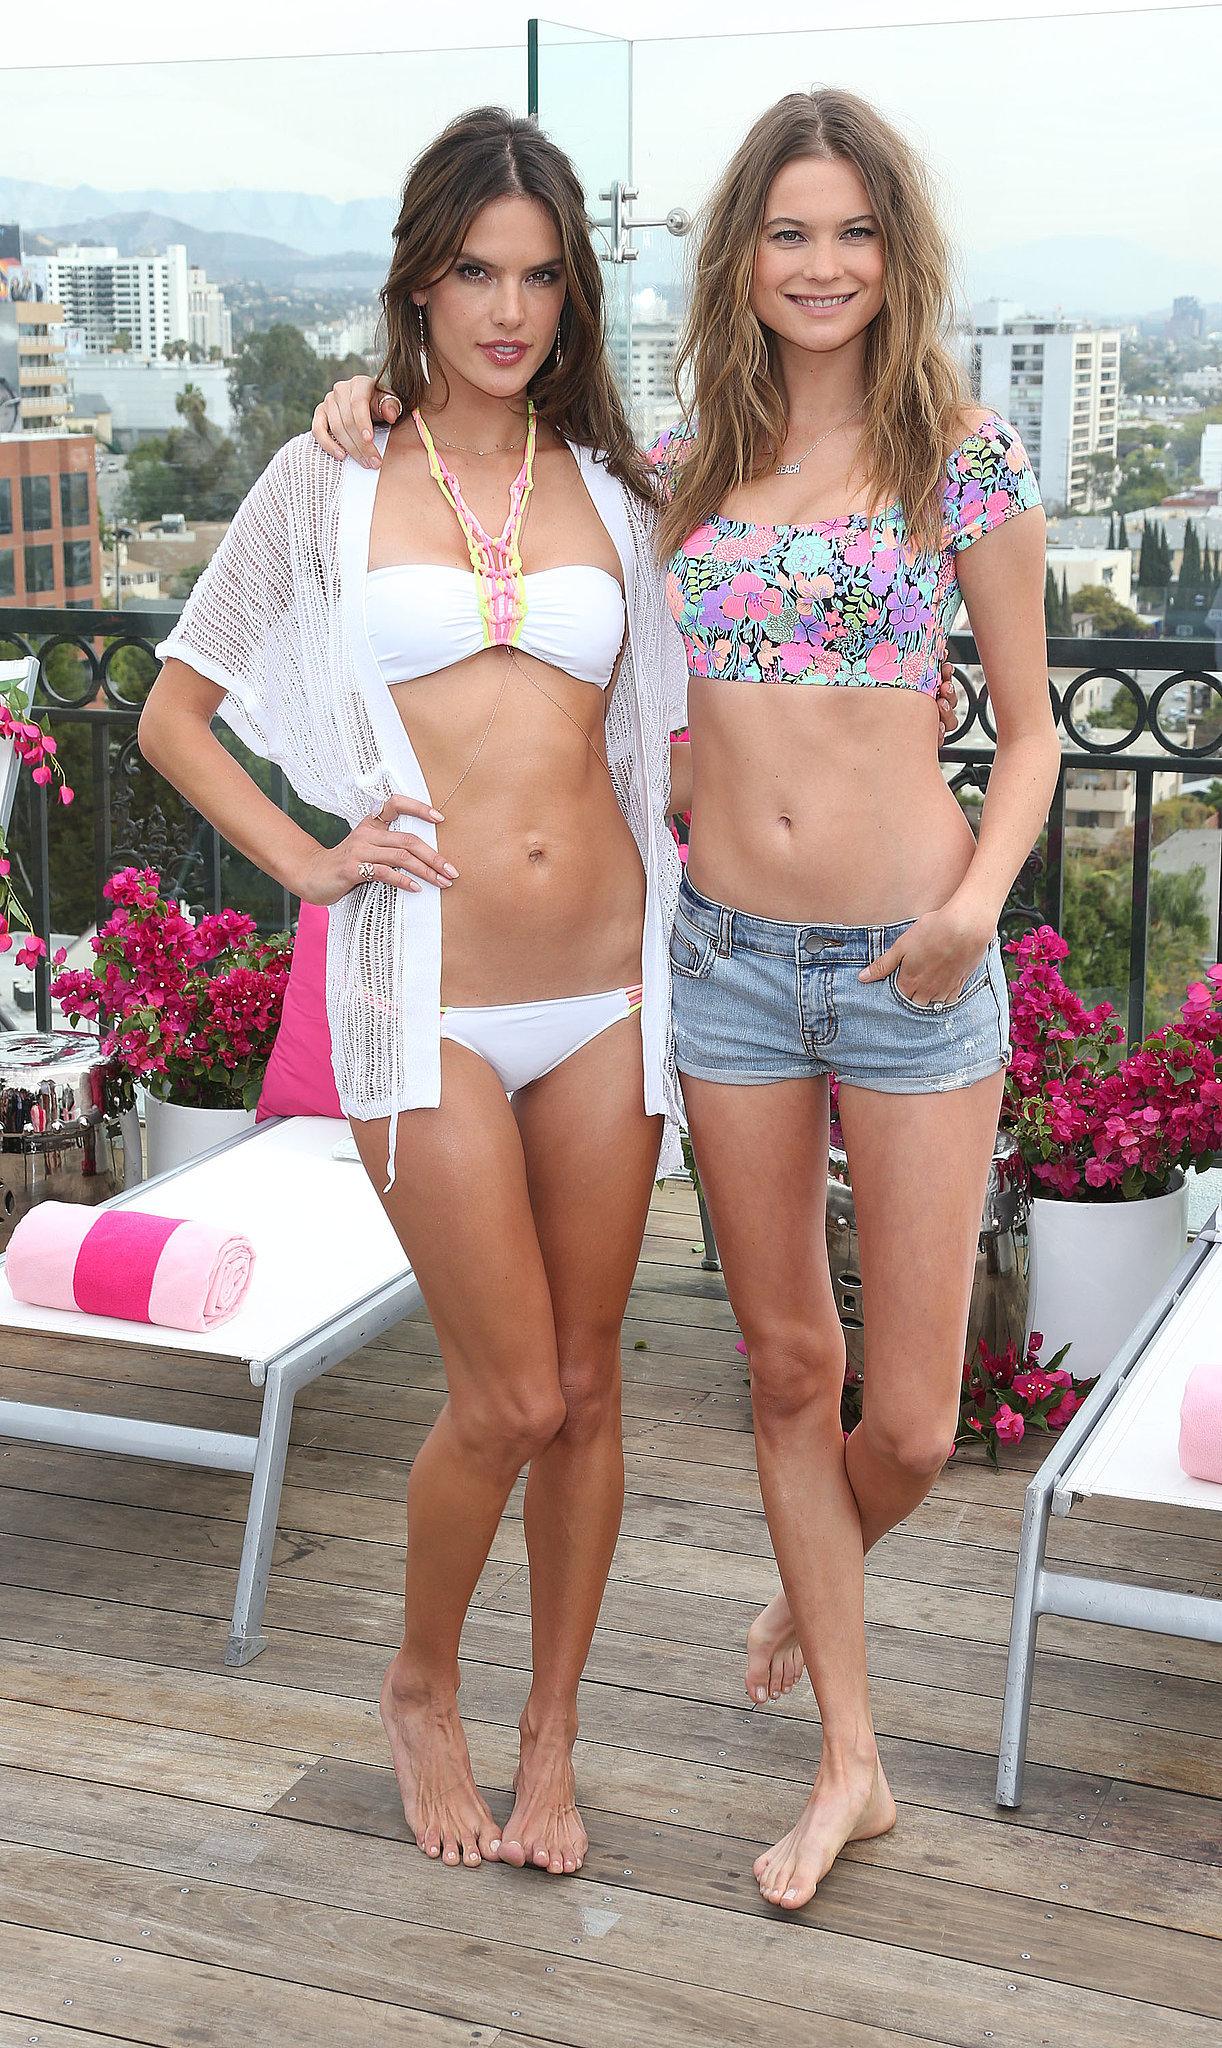 Alessandra Ambrosio and Behati Prinsloo